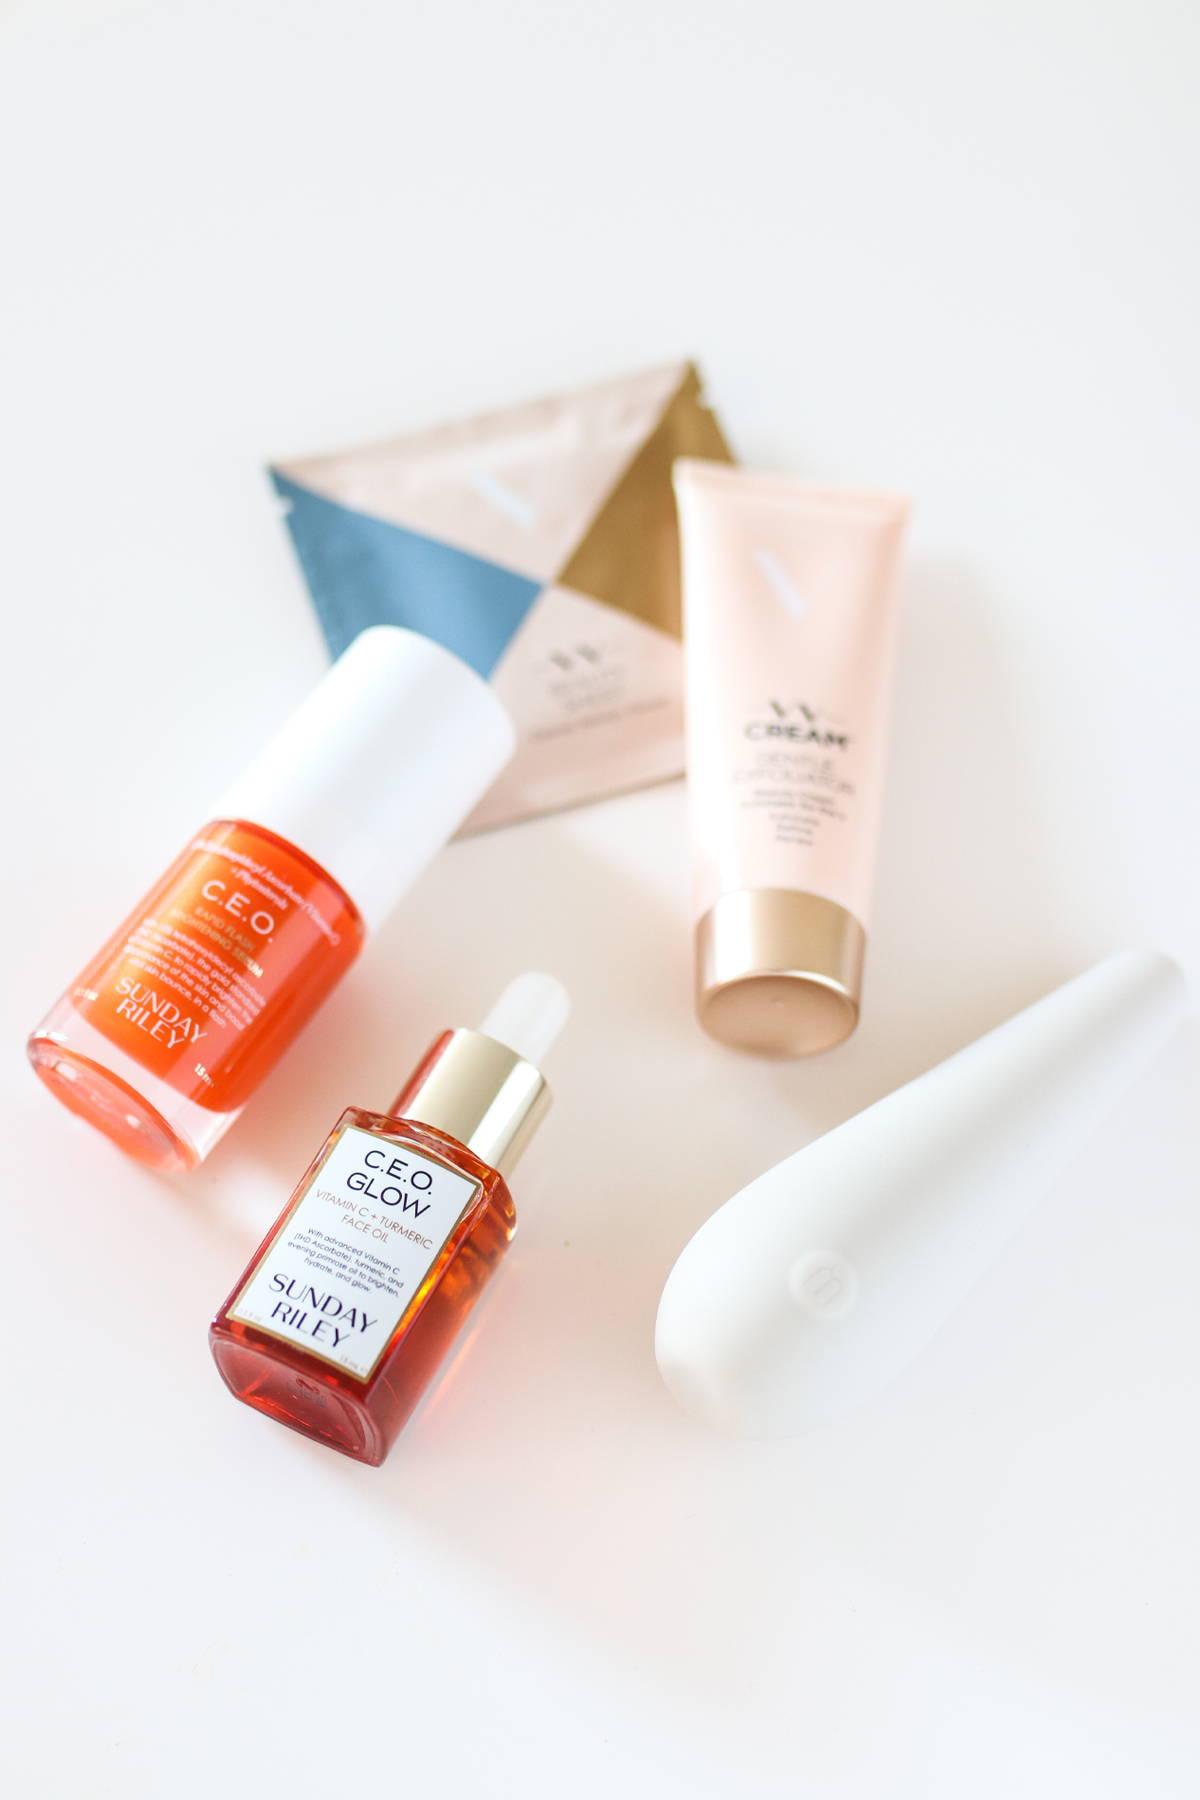 The Love Box assorted items, C.E.O. Glow, C.E.O. Brightening Serum, Maude Vibe,  The Perfect V Cream and VV Beauty Sheet